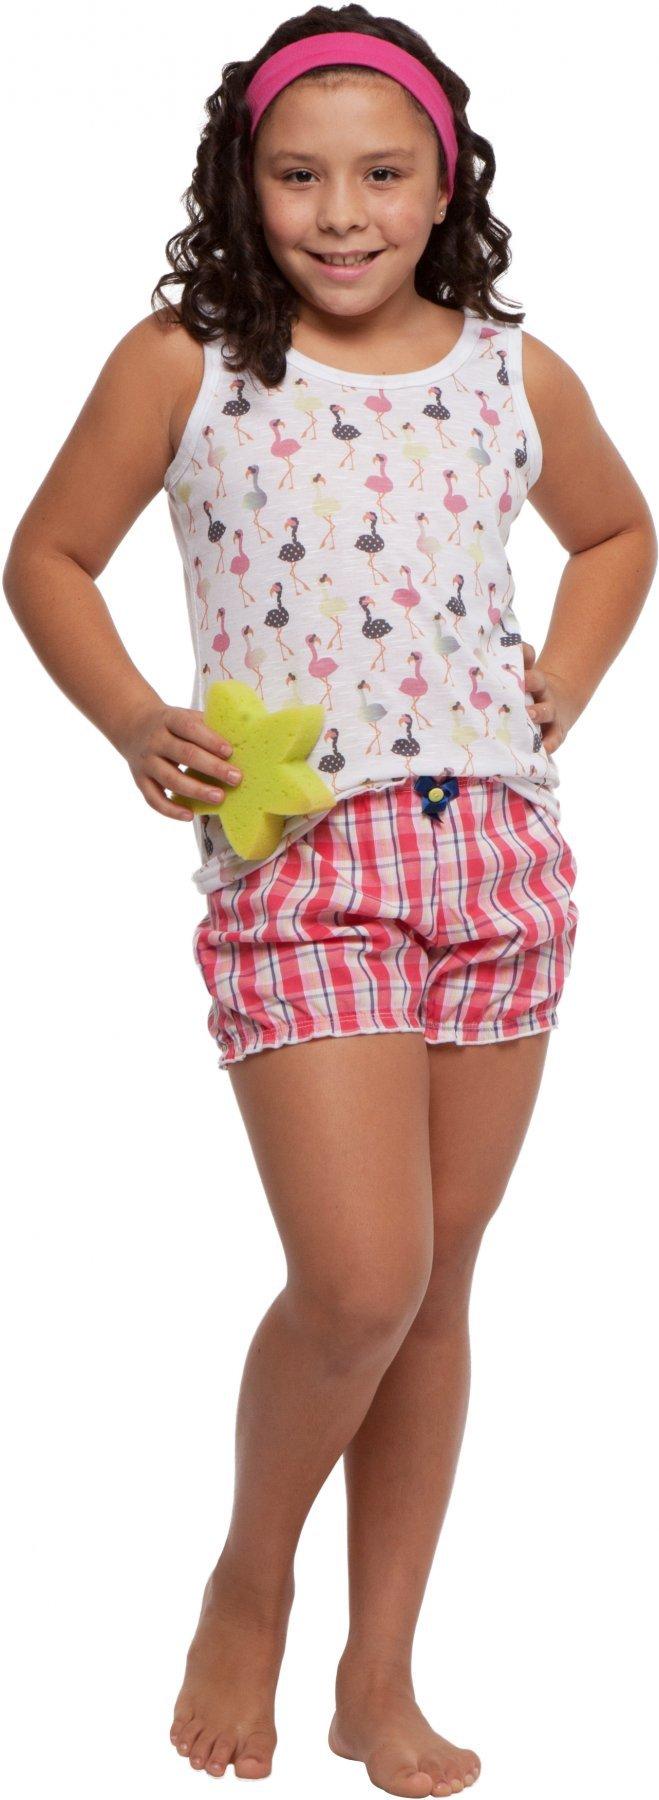 Short Doll Infantil Flamingo Promoção